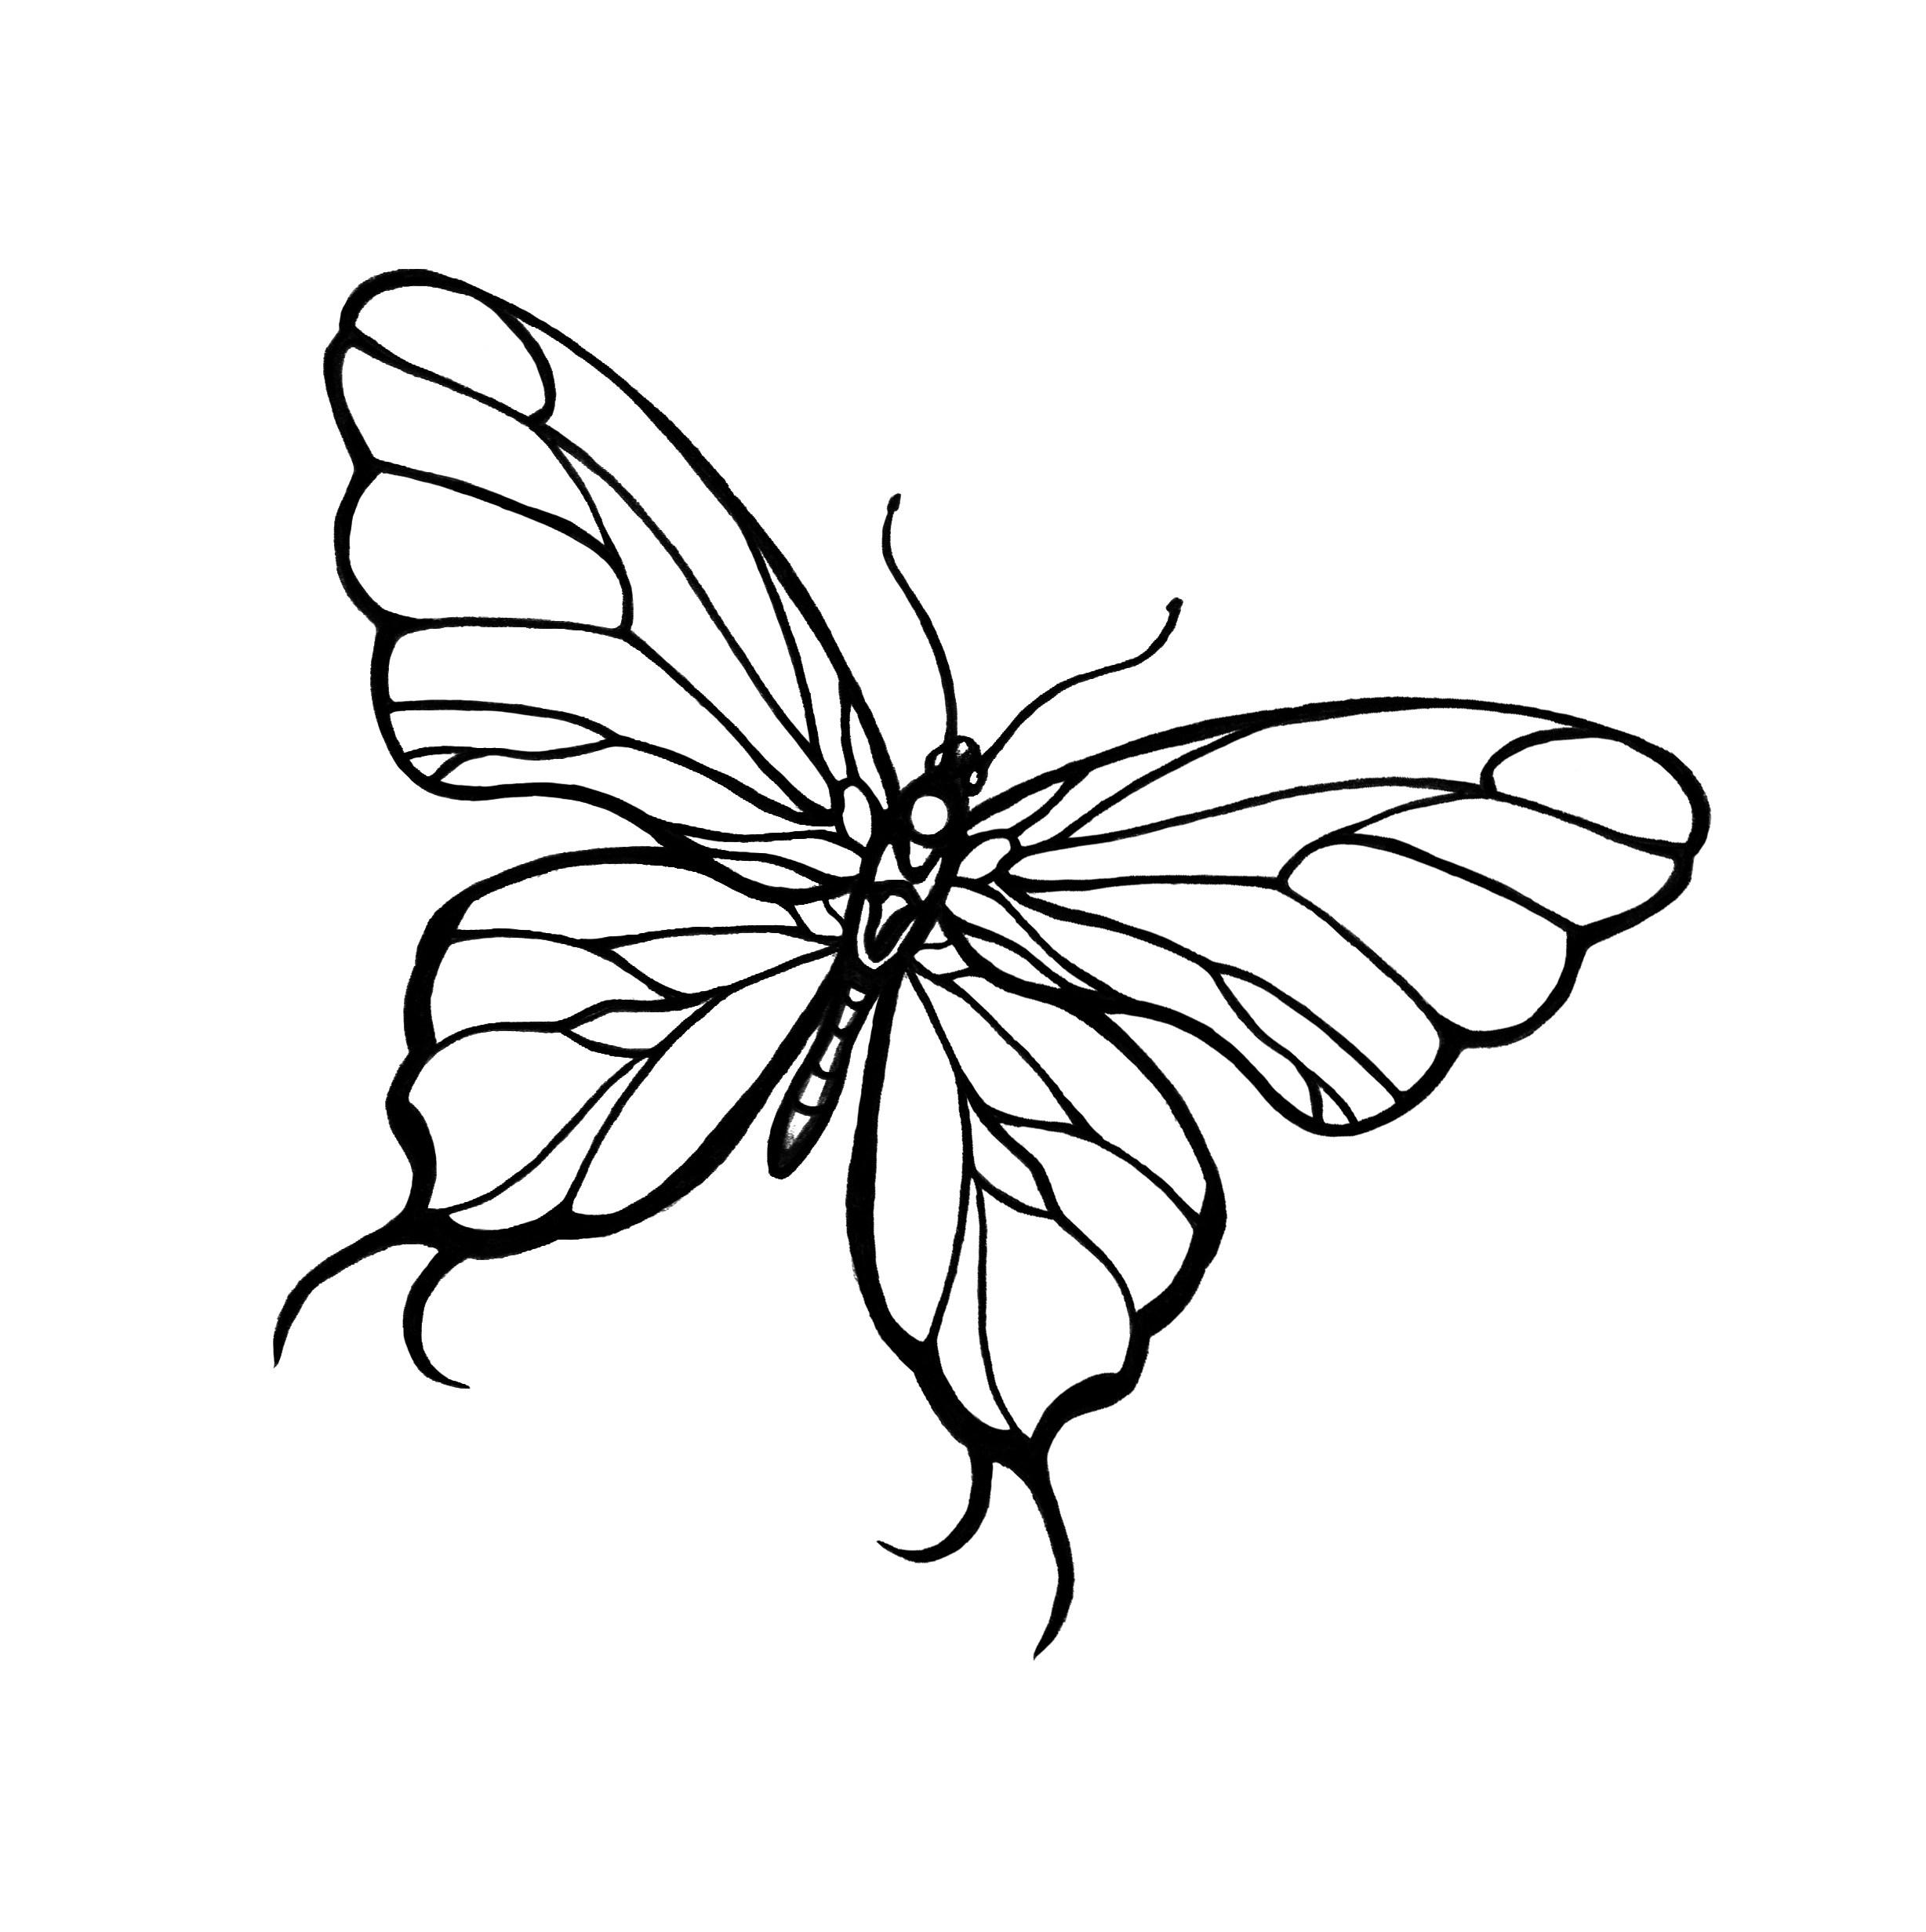 2456x2464 Simple Butterfly Drawing Line Tattoo Inspirati